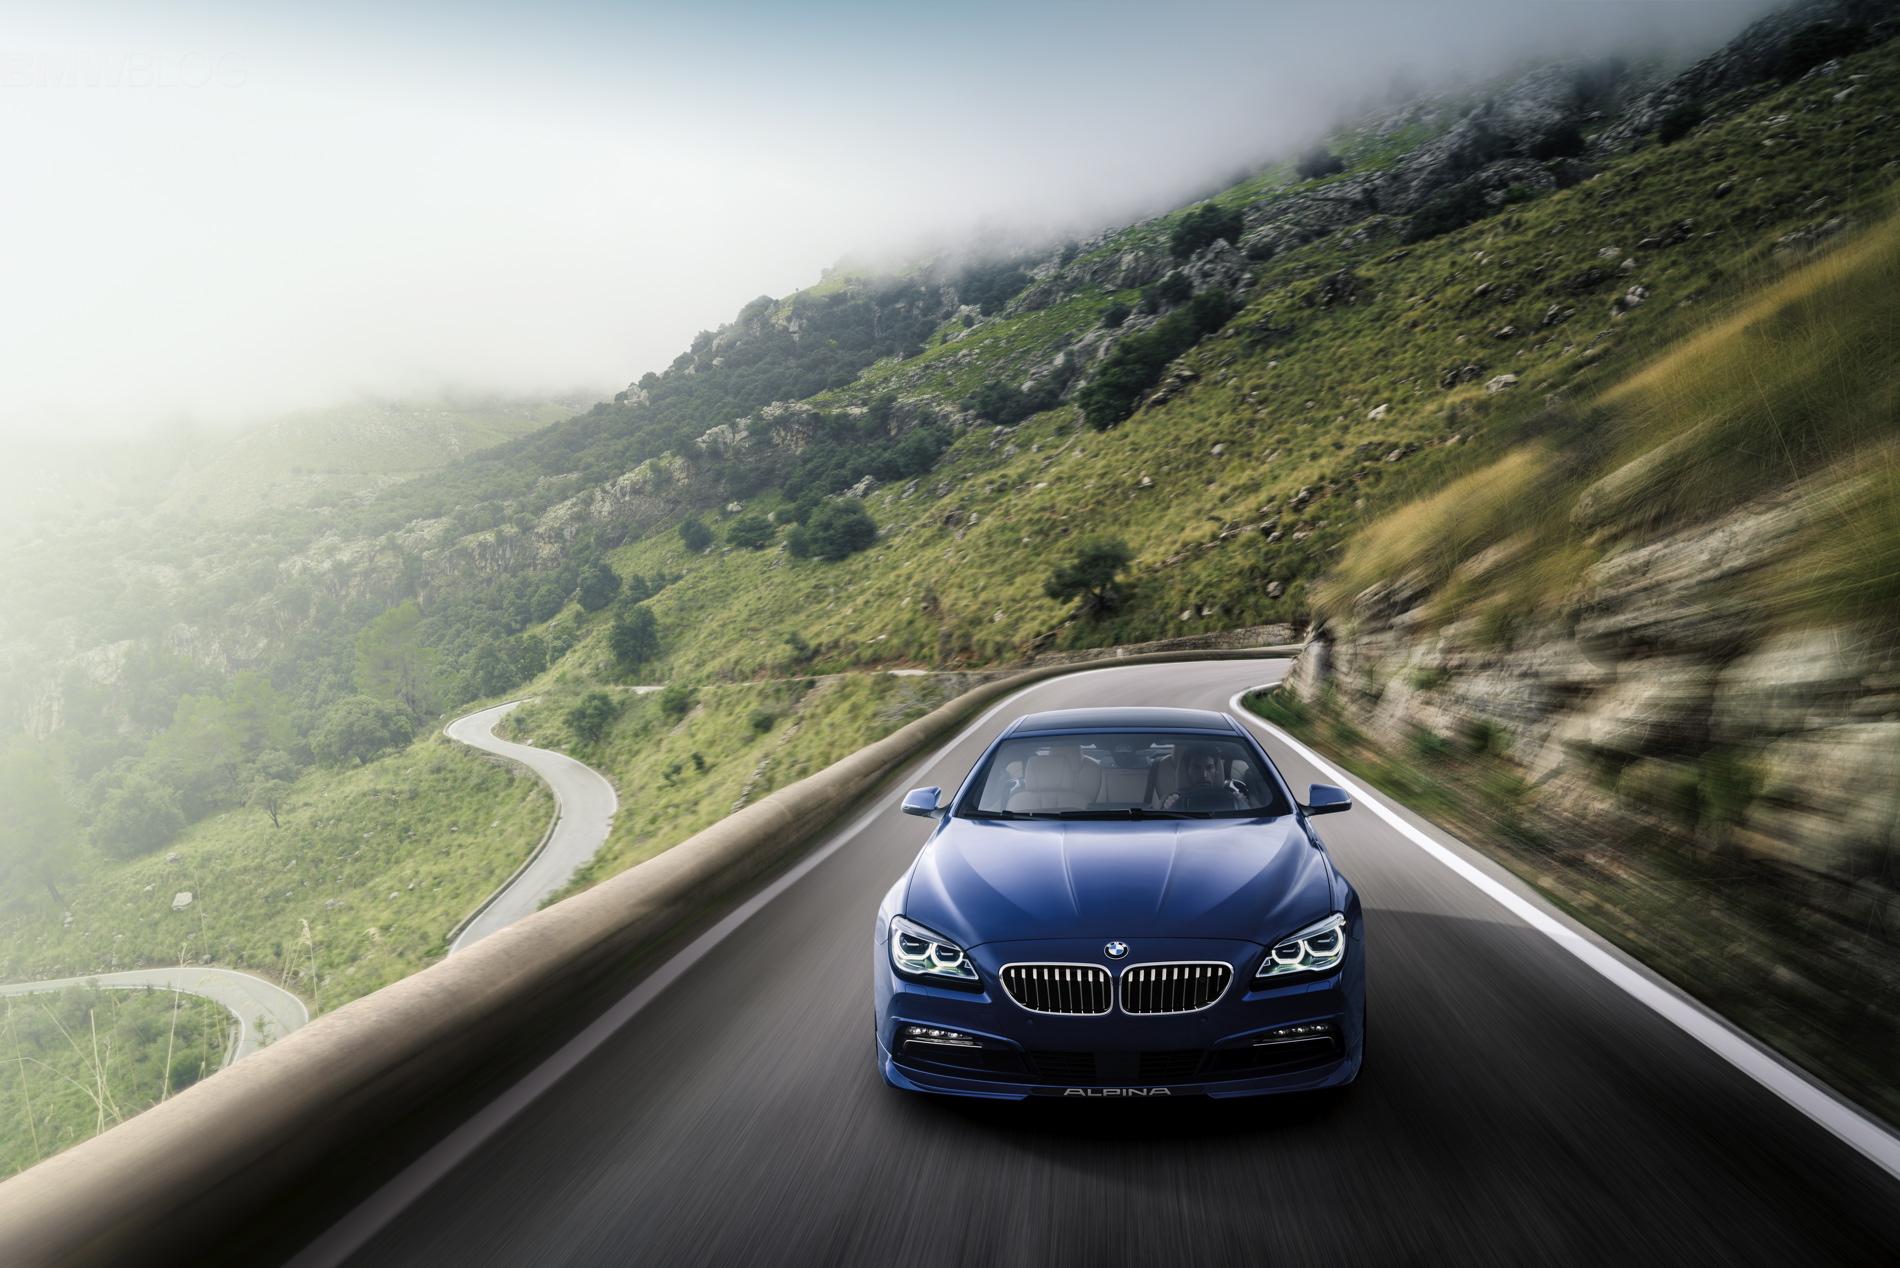 2016 bmw alpina b6 xdrive gran coupe images 04